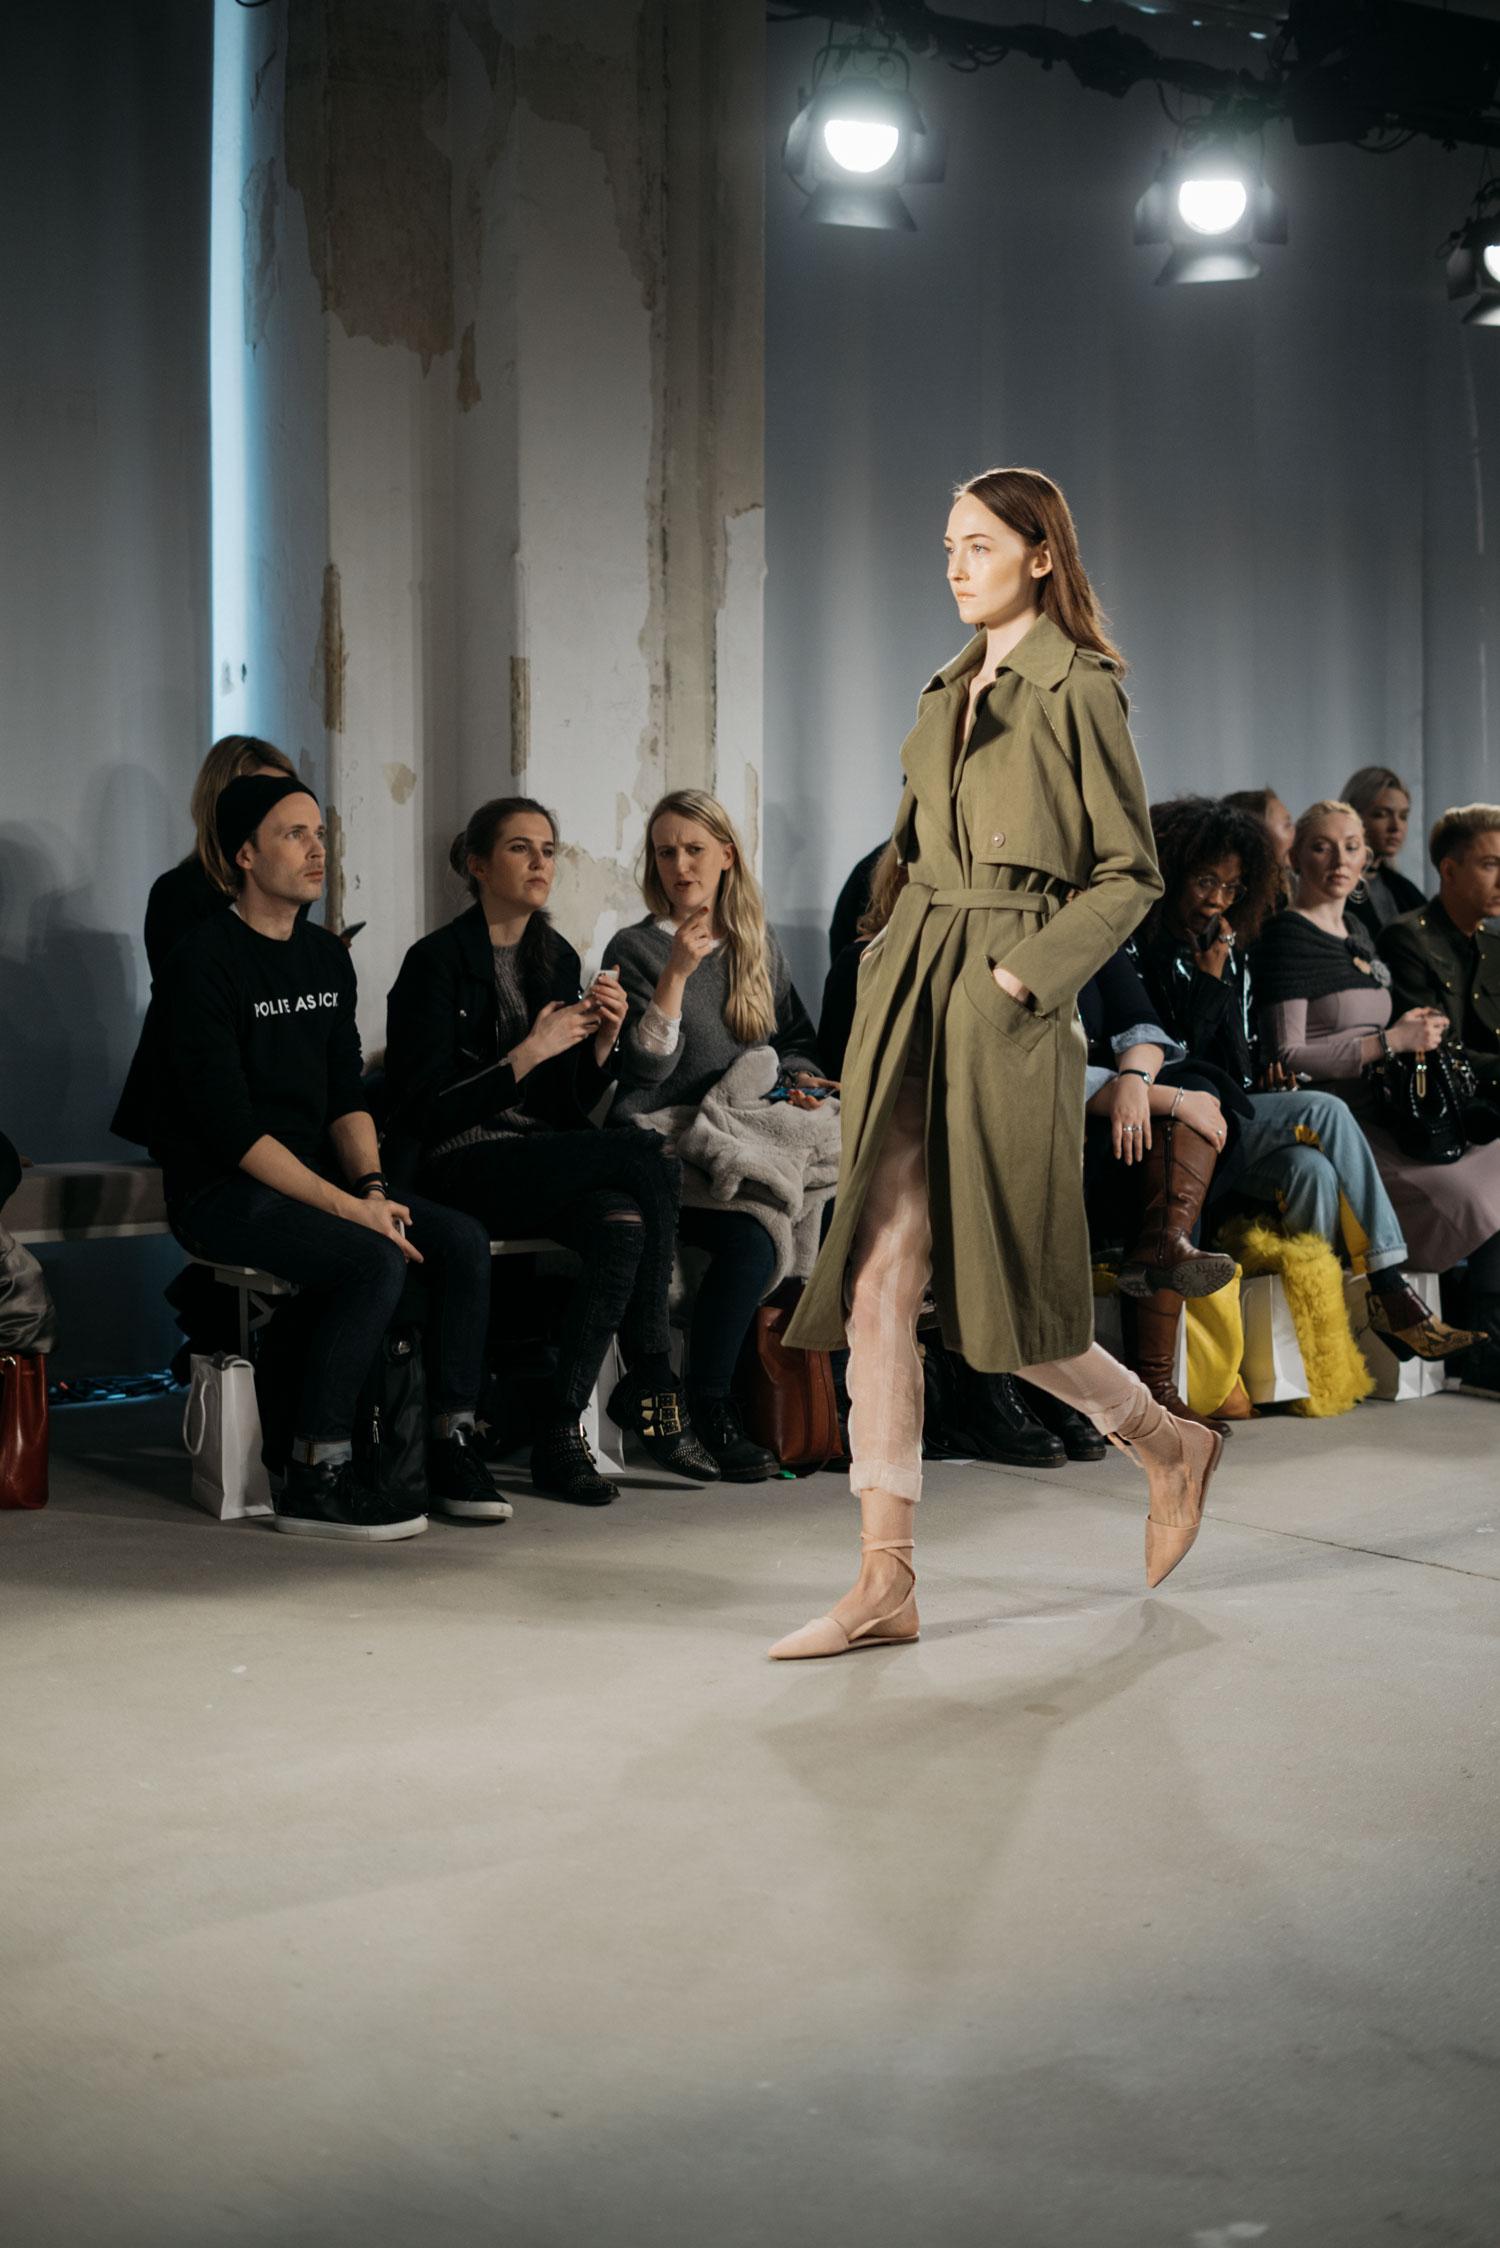 Masha Sedgwick | Fashionweek |Trendreport |Trends | Berlin | Germany | Blog